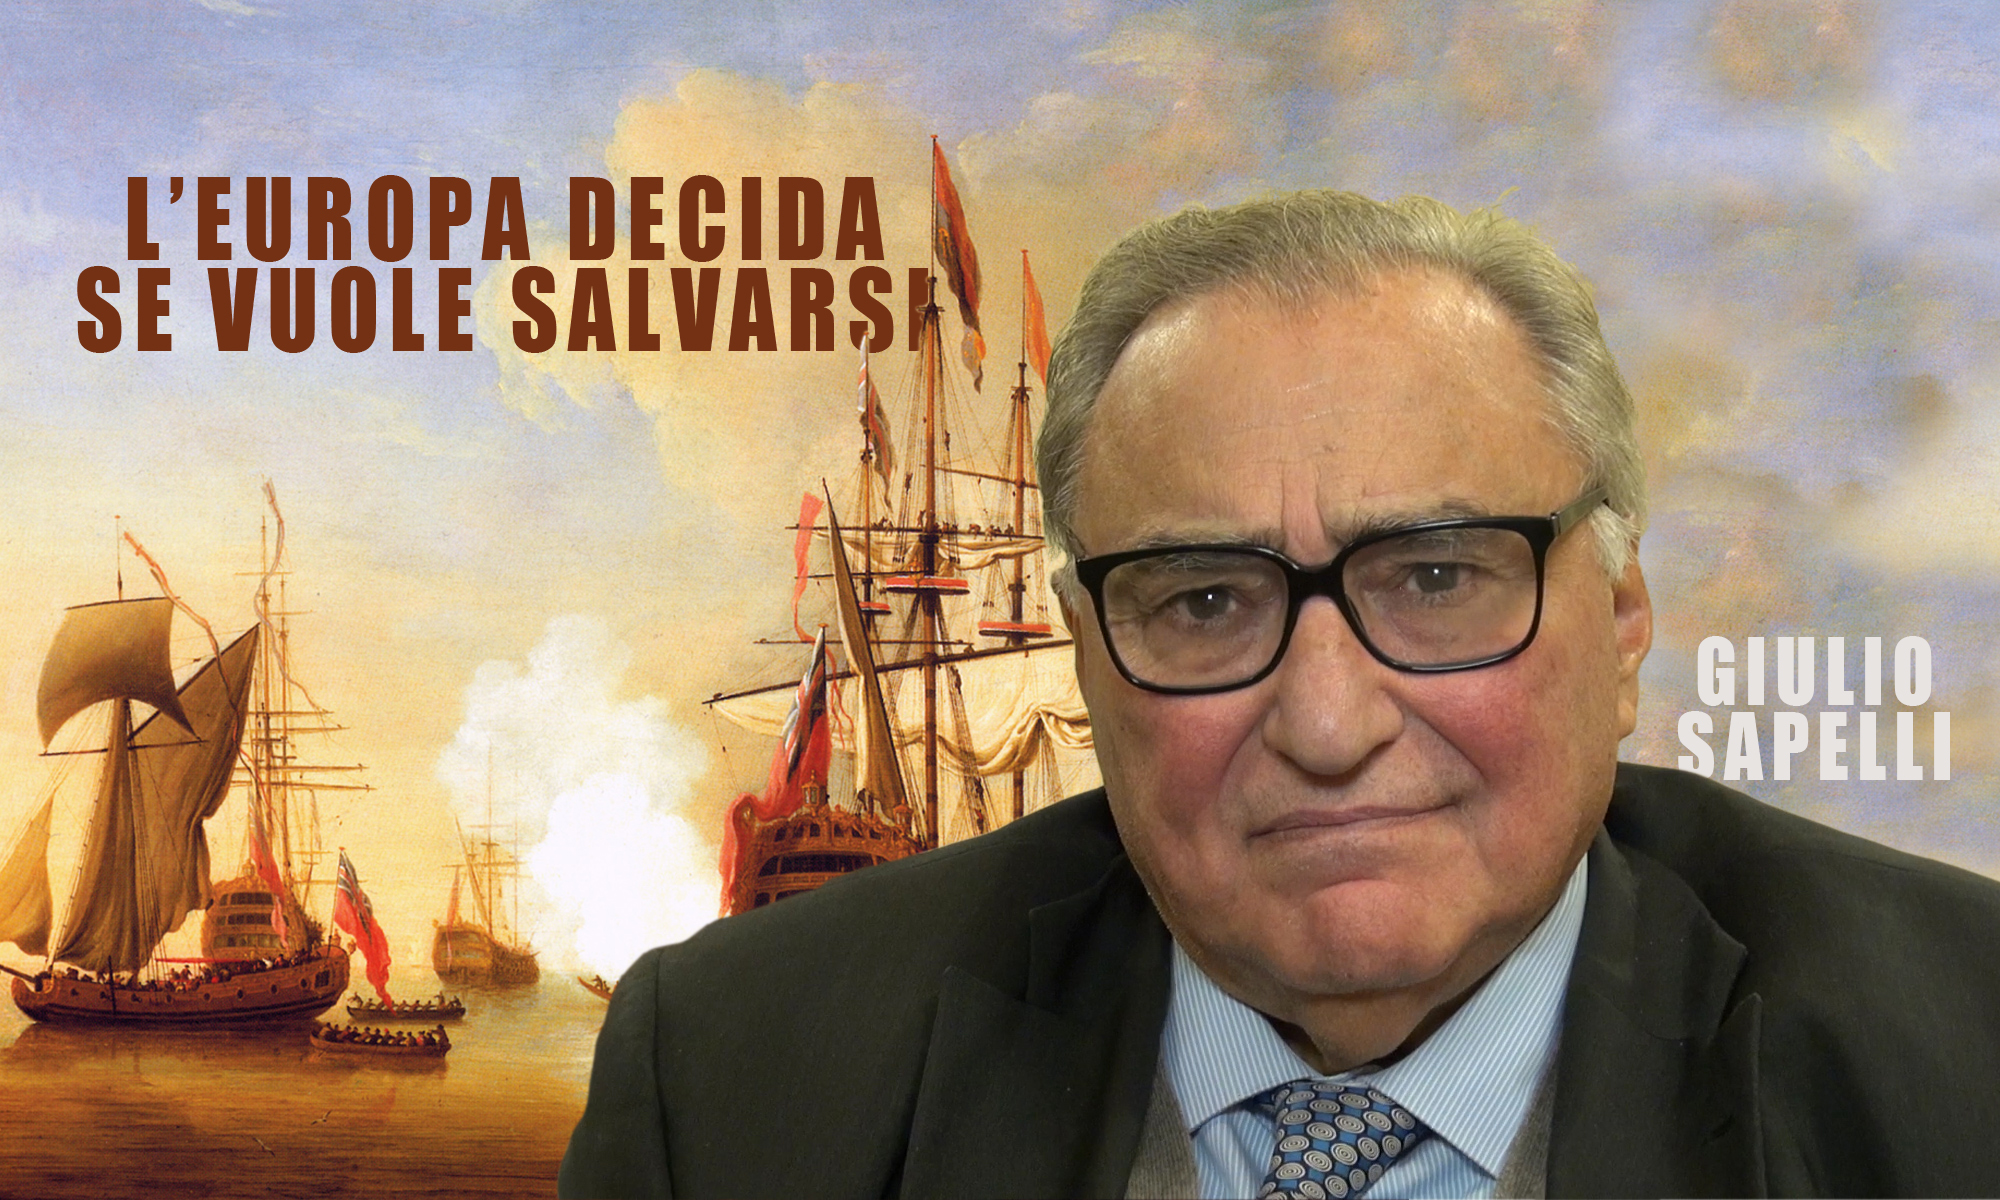 Giulio Sapelli: «L'Europa decida se vuole salvarsi»